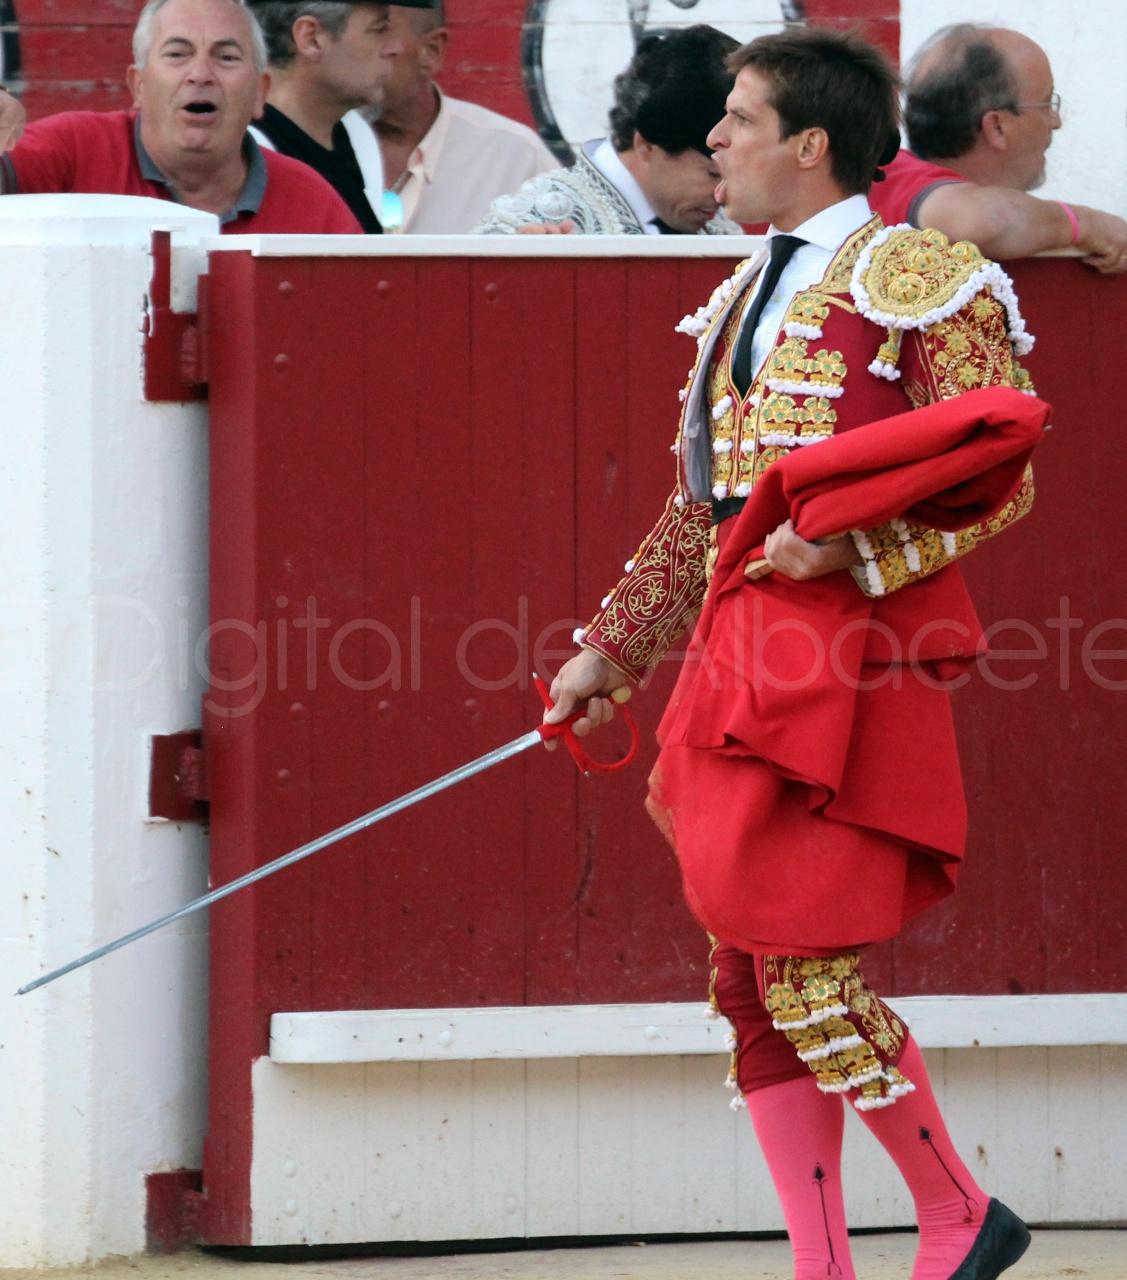 El Juli Lopez Simon y Garrido Feria Albacete 2015 toros  112